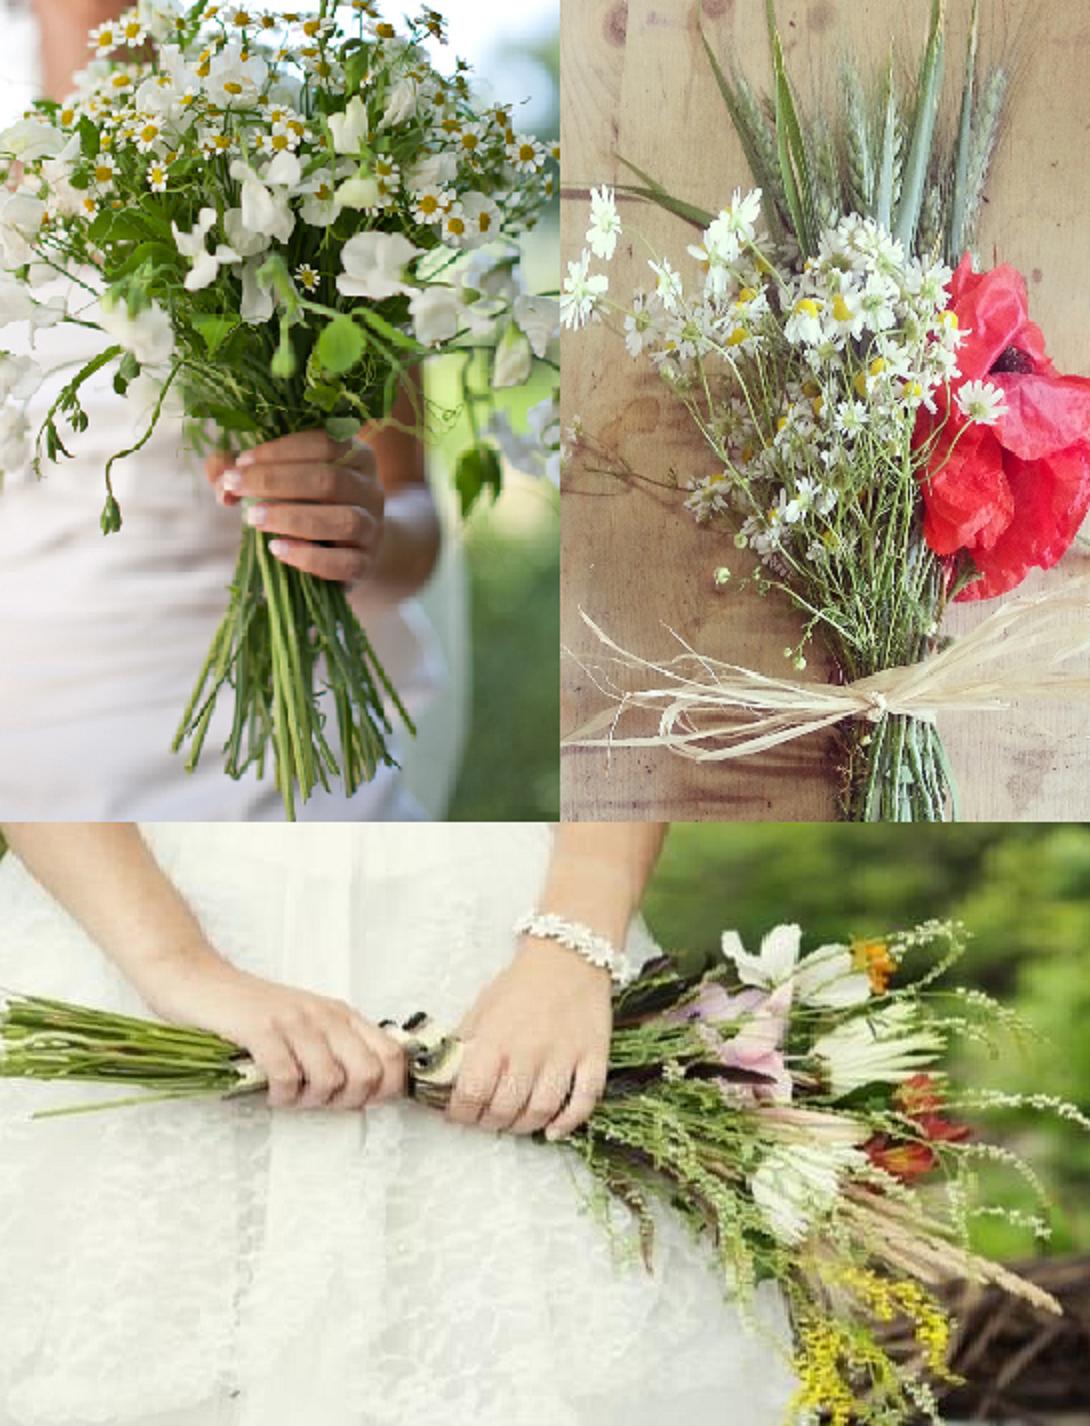 Matrimonio economico wedding low cost matrimonio shabby chic for Bouquet chic